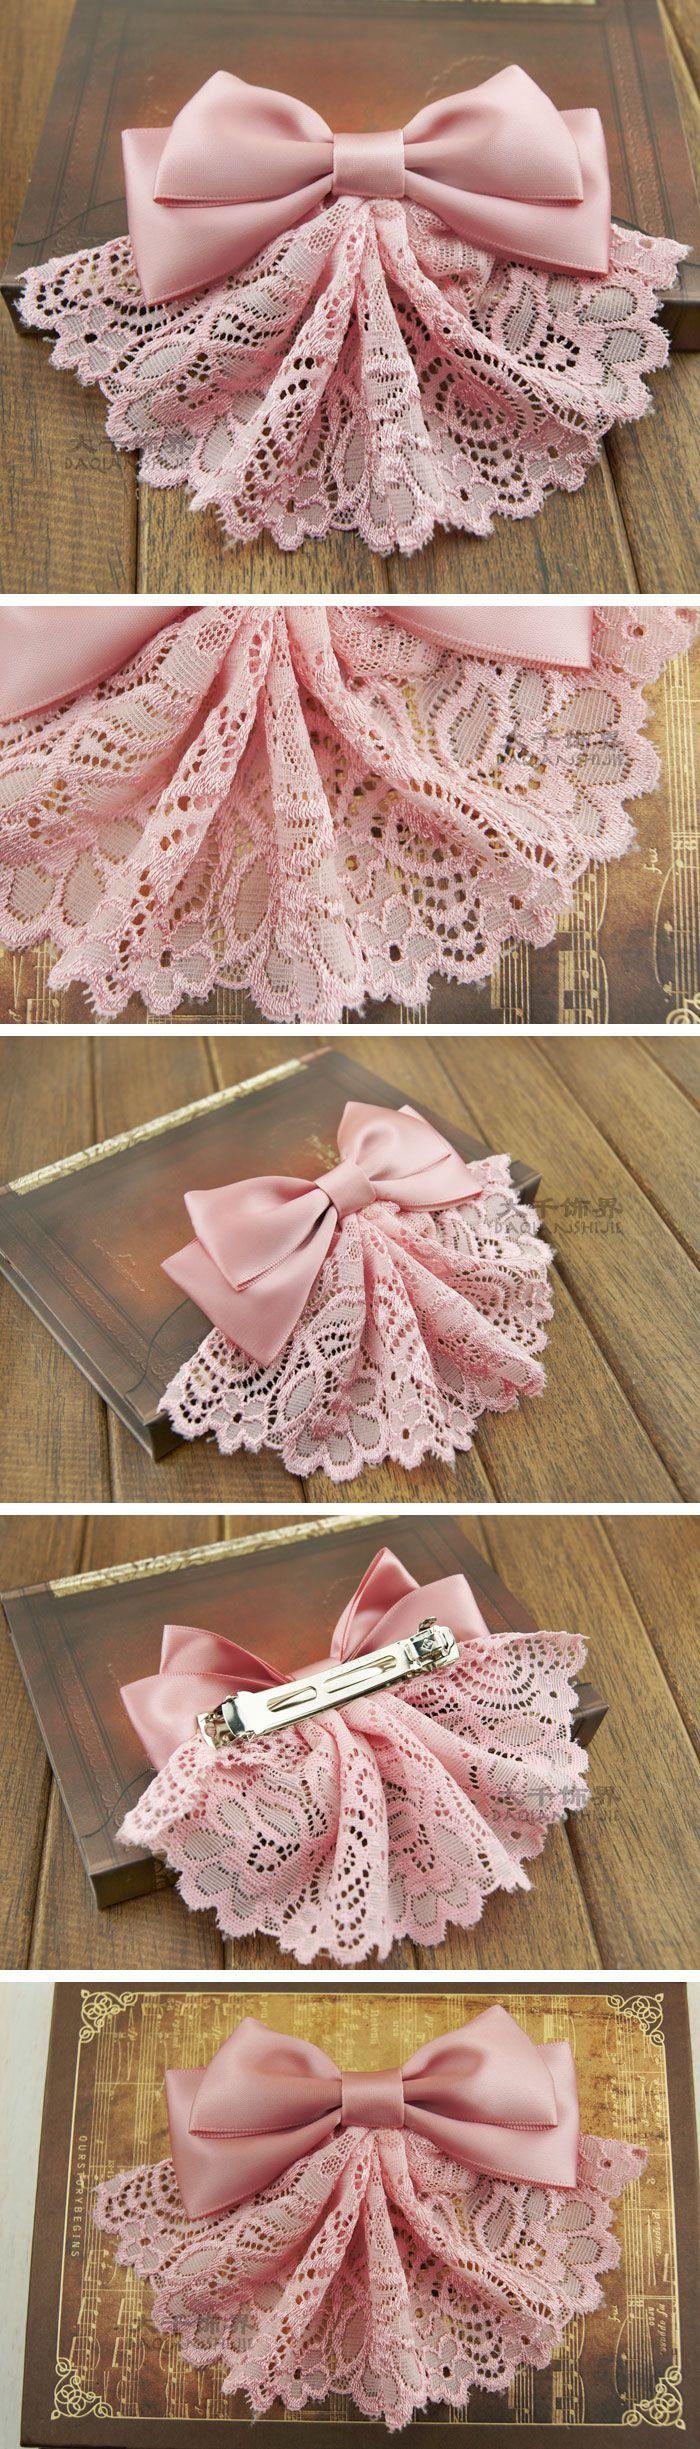 Lace bow hair accessories | BODA CIVIL Y VESTIDO DE NOVIA CORTO ...